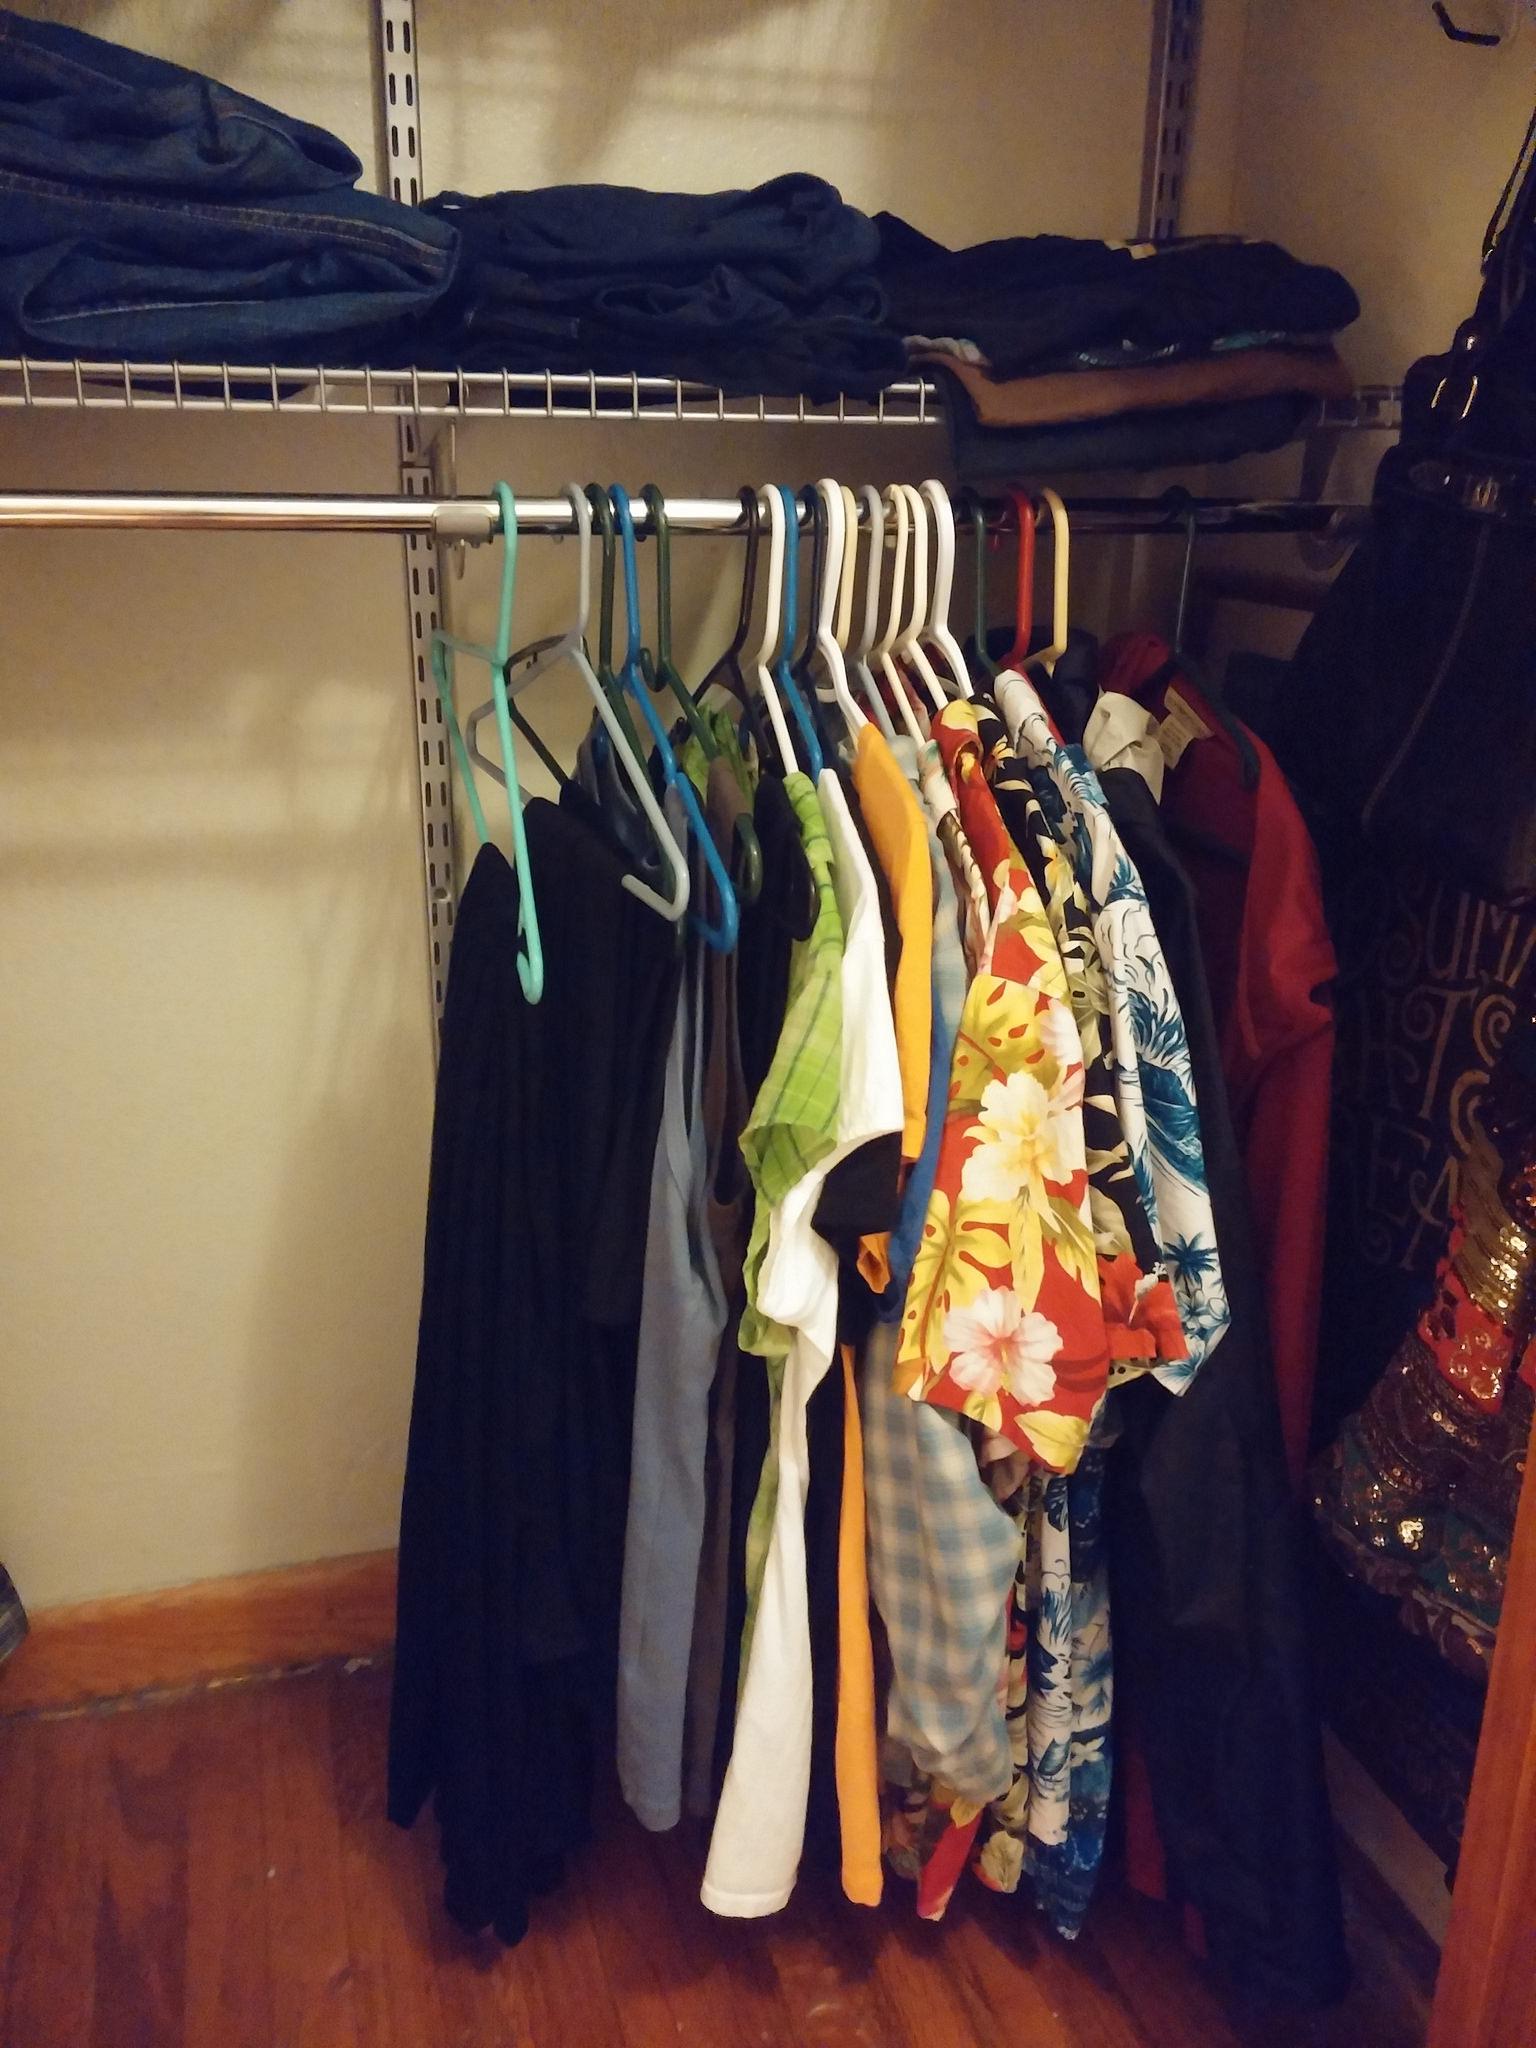 My entire summer capsule wardrobe, minus a few work shirts.